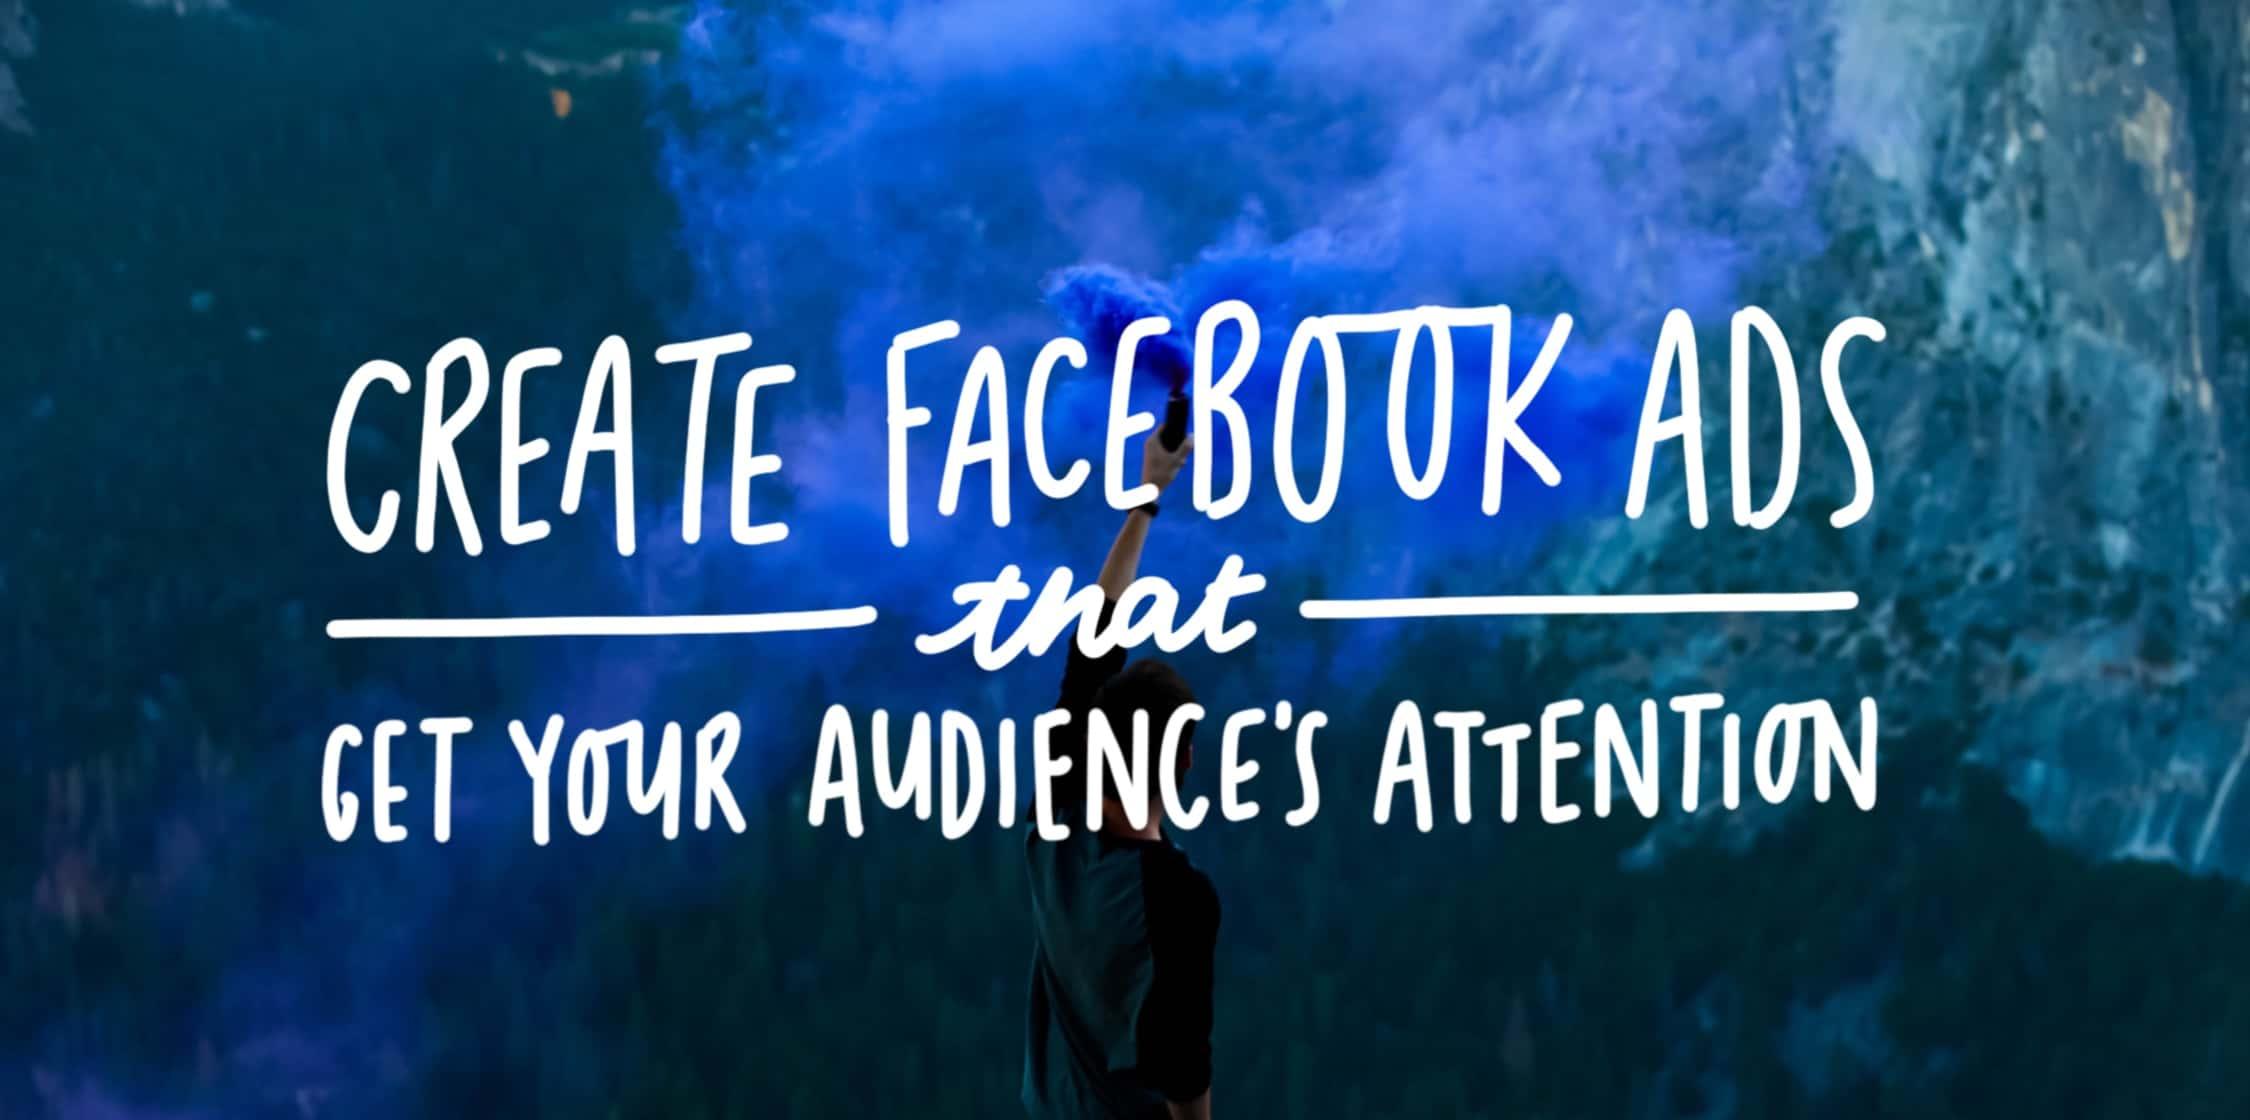 kursus facebook ads jakarta terfavorit